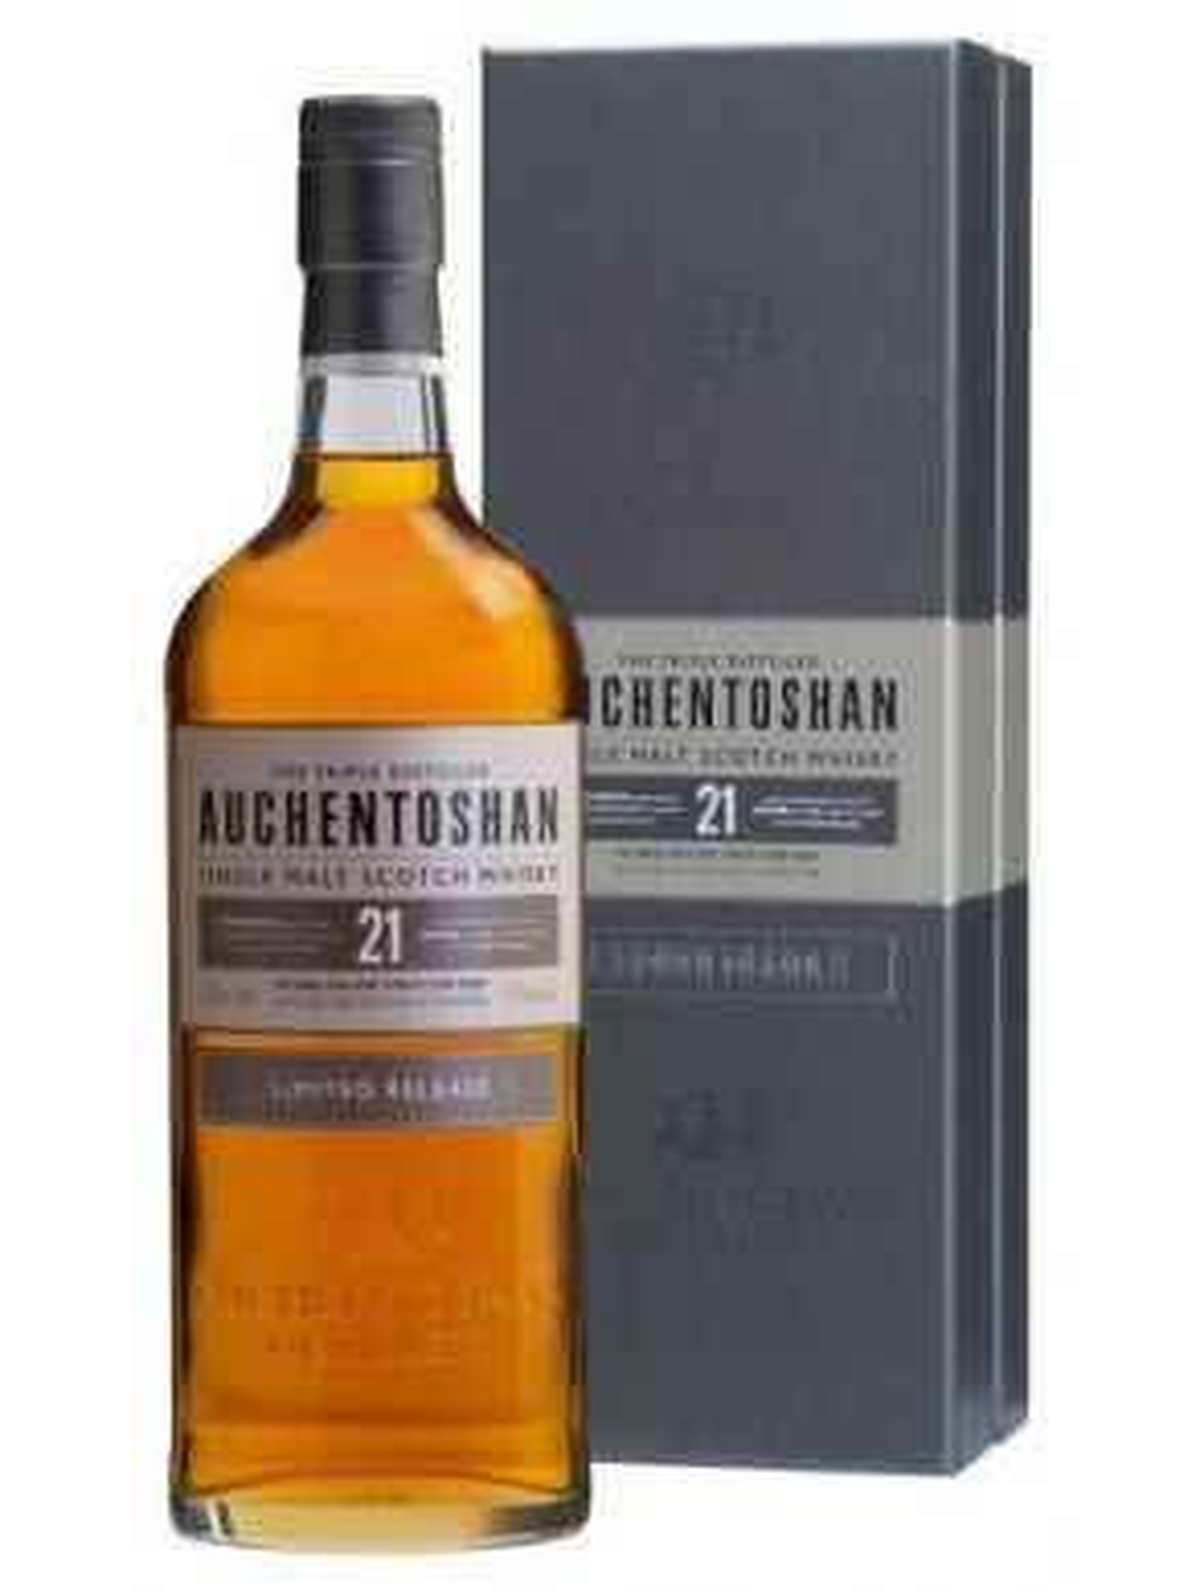 Auchentoshan 21 Year Old Whisky Gift Box